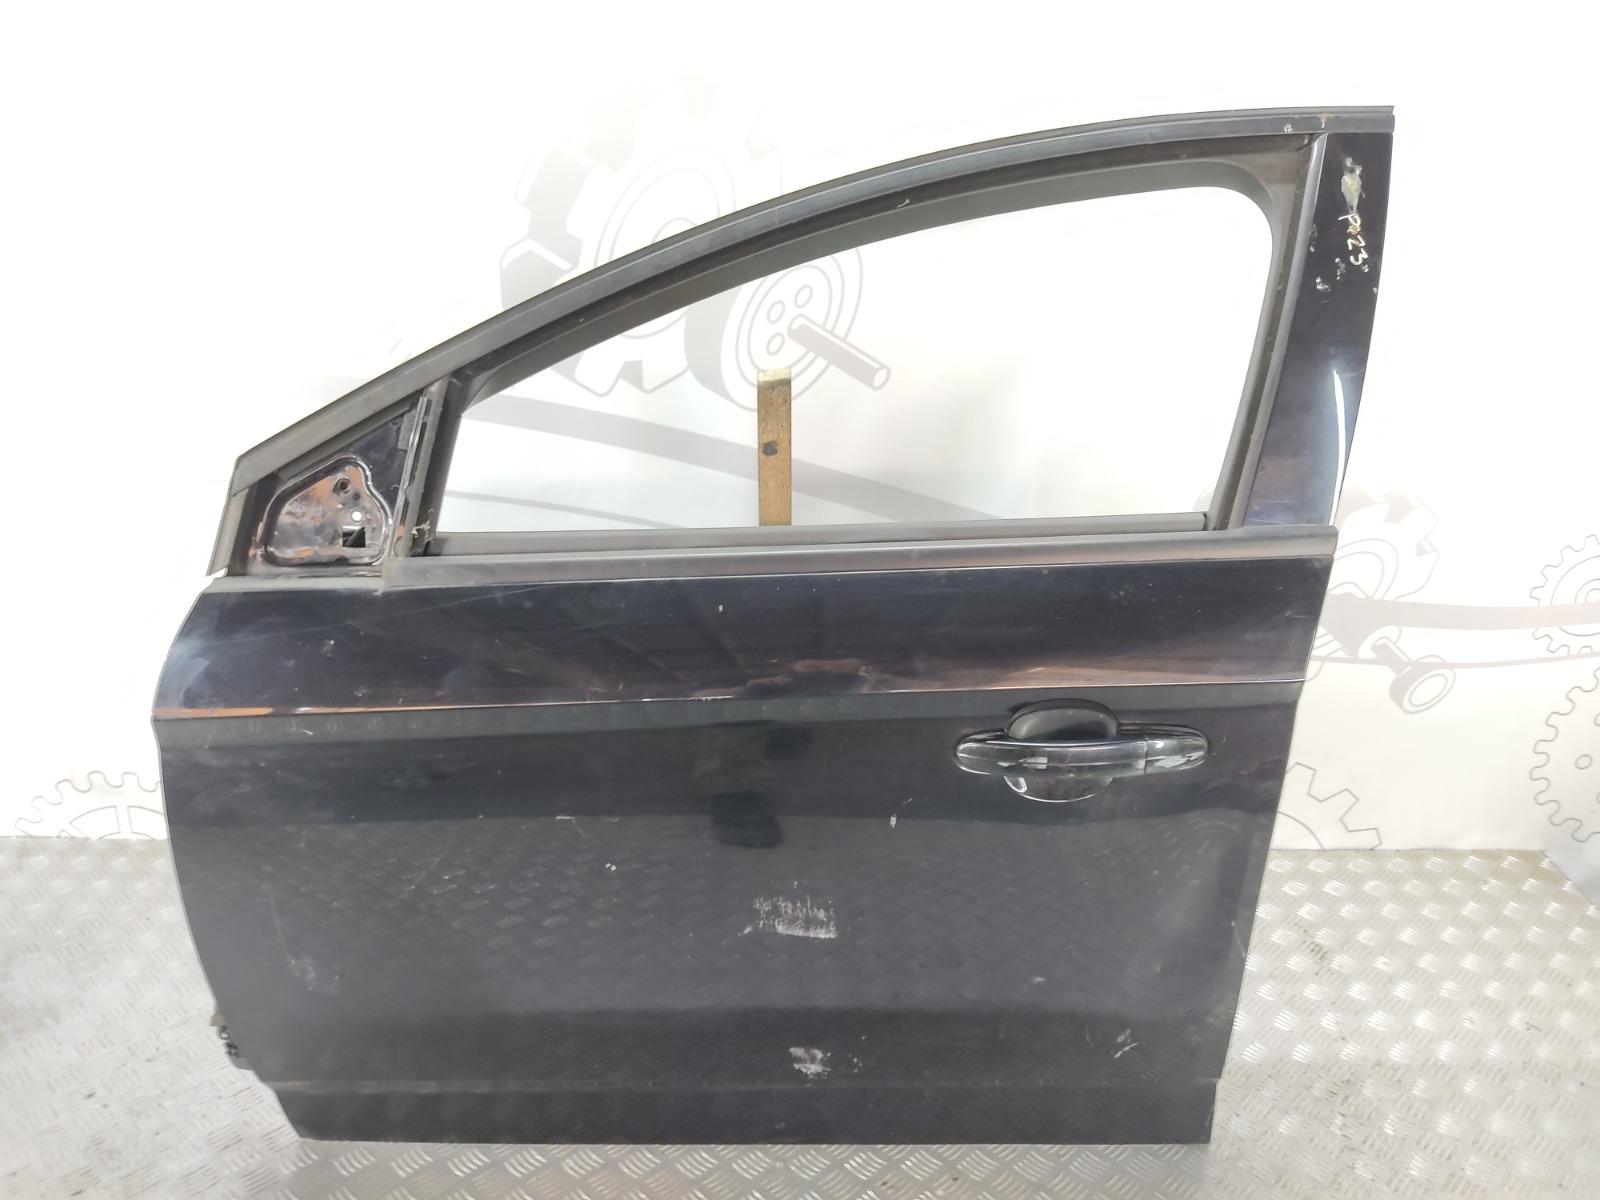 Дверь передняя левая Ford Mondeo 2.0 TDCI 2008 (б/у)